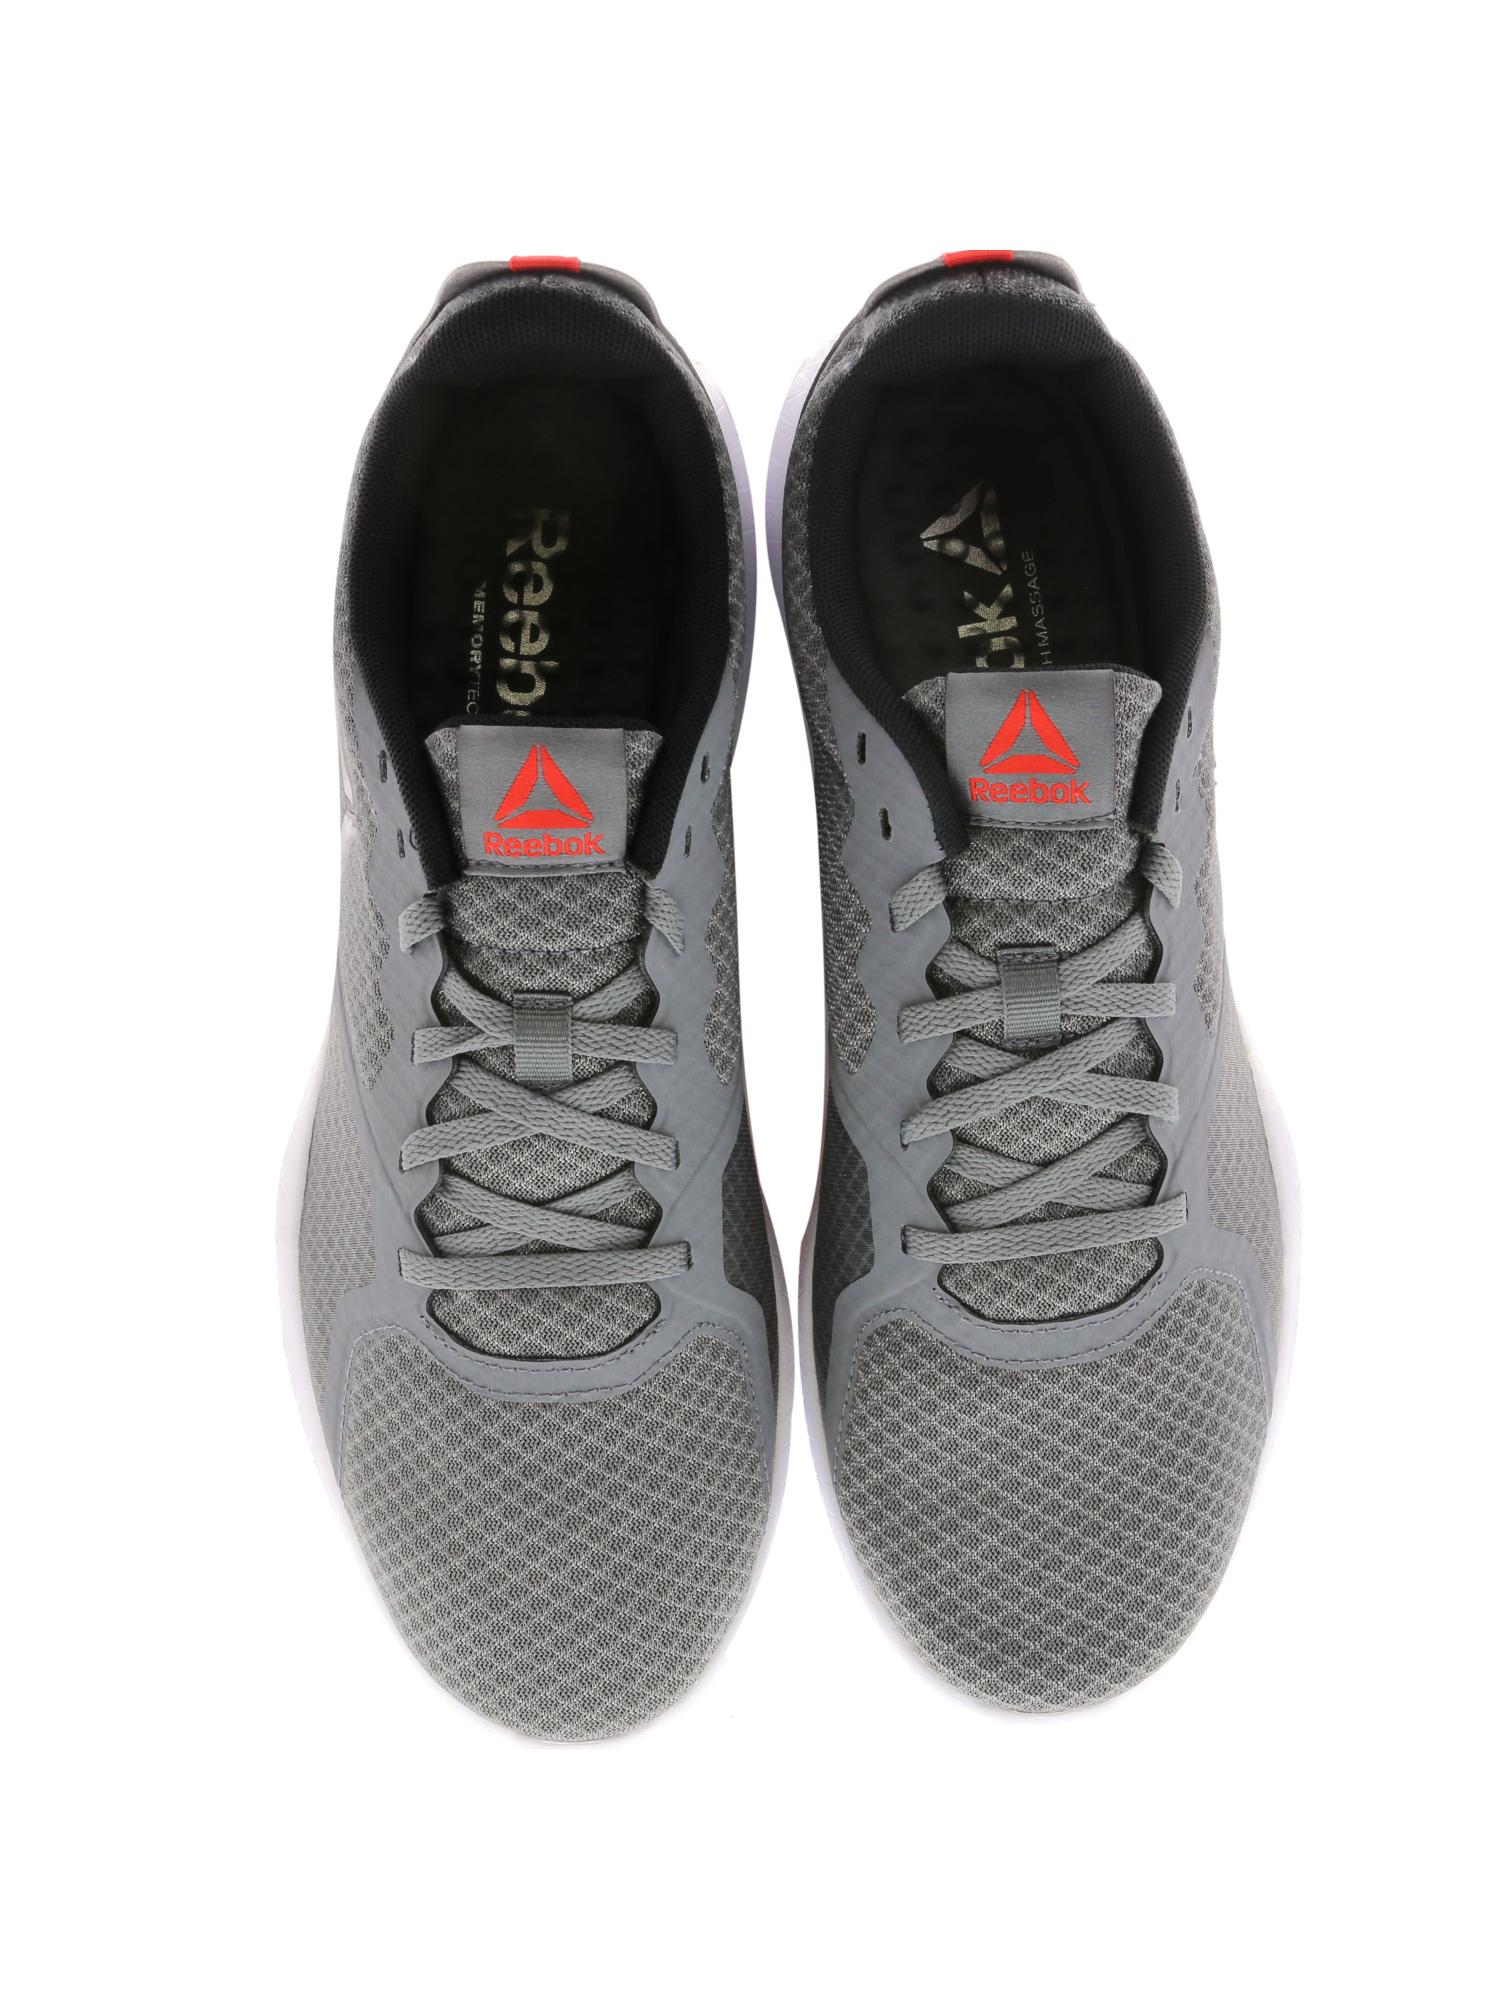 Reebok-Men-039-s-Flexagon-Force-Ankle-High-Training-Shoes thumbnail 5